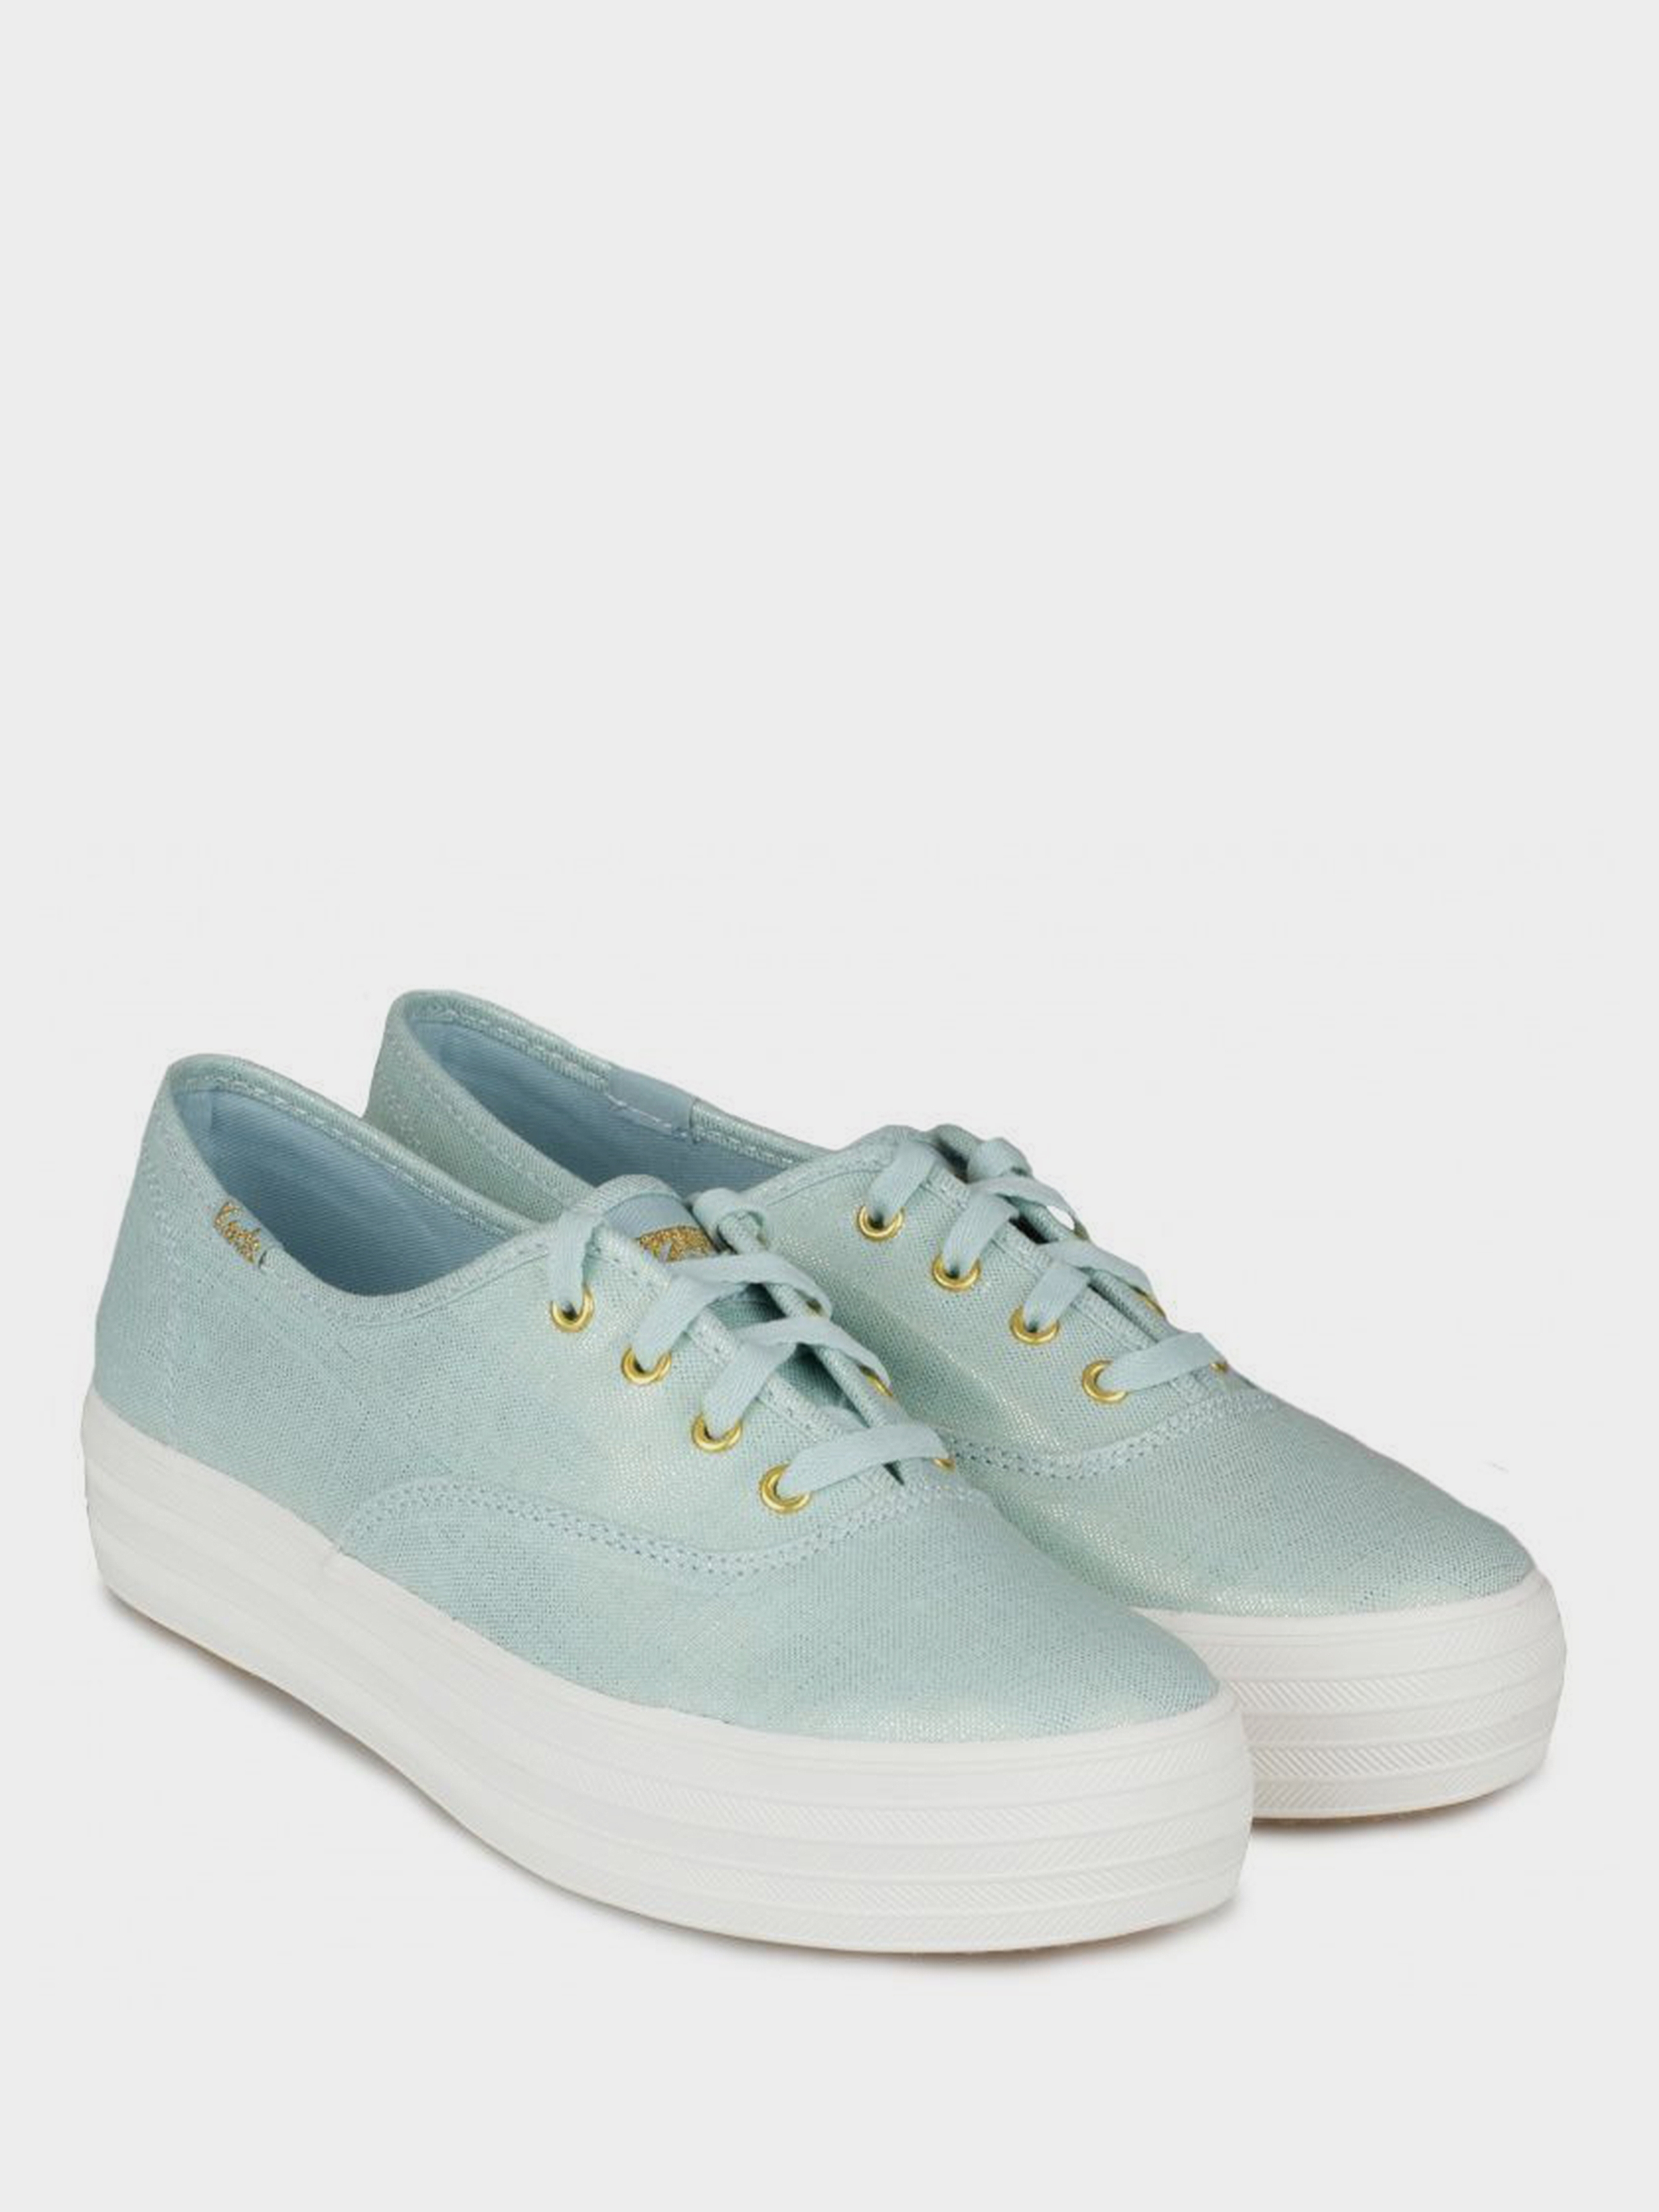 Кеды для женщин KEDS KD283 цена обуви, 2017